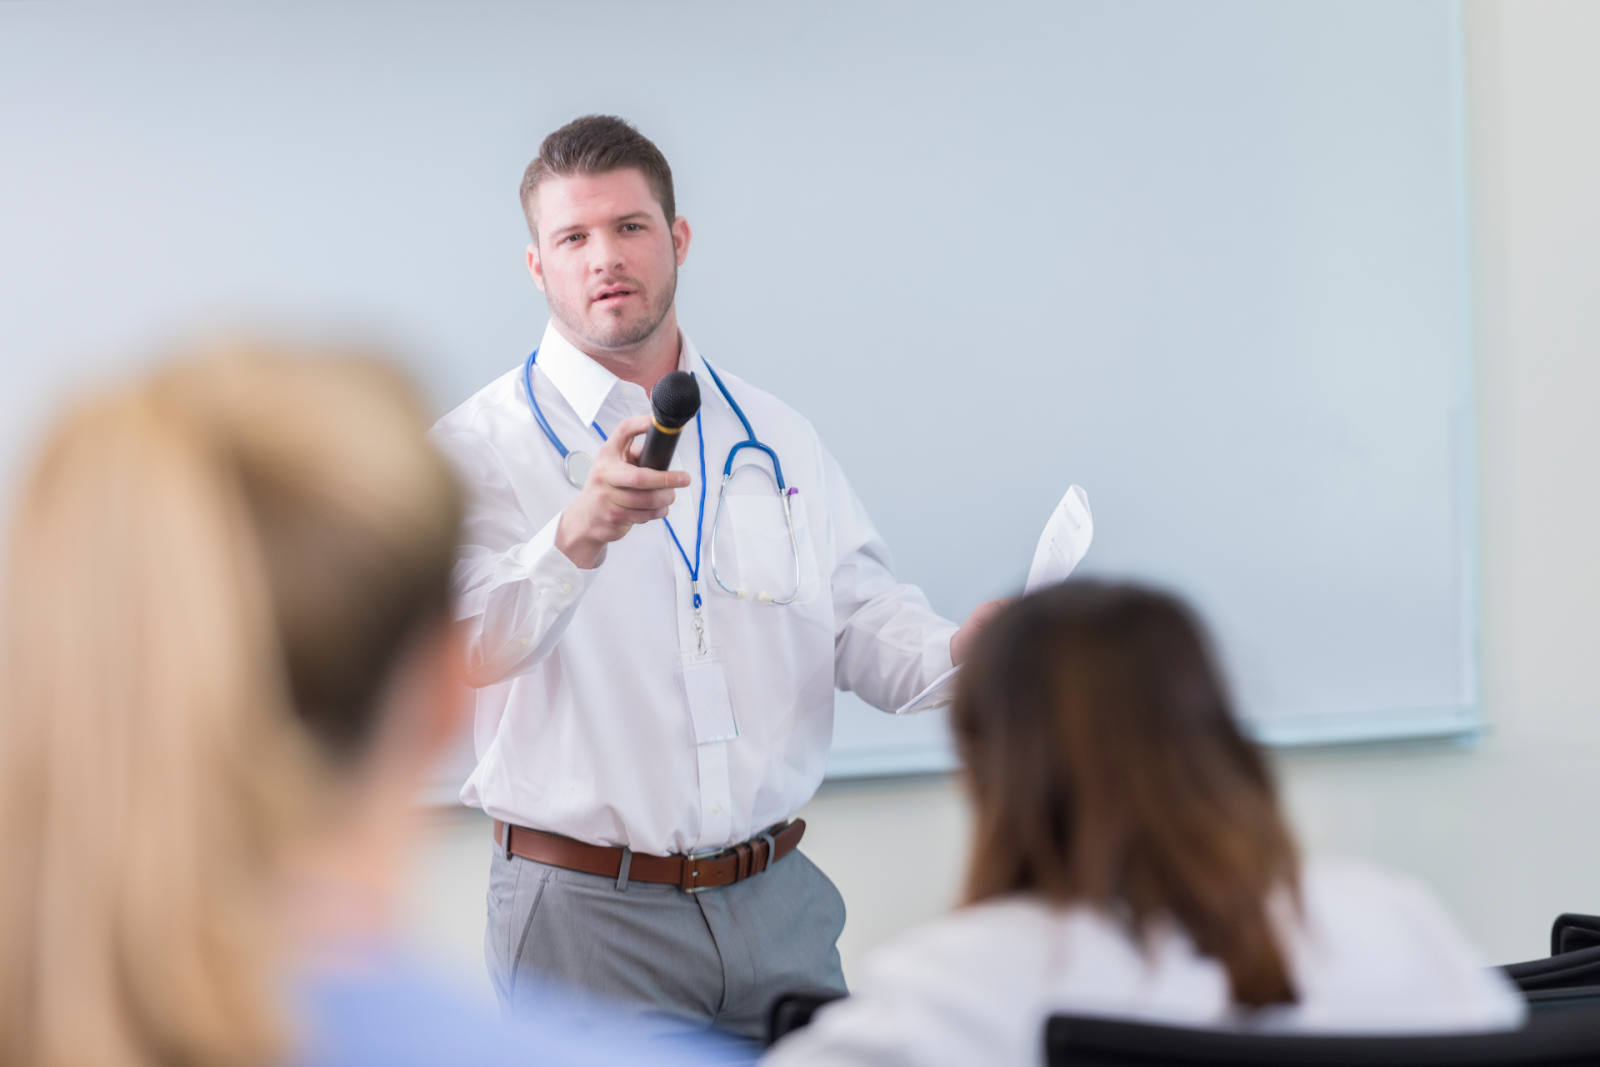 man speaking to medical class